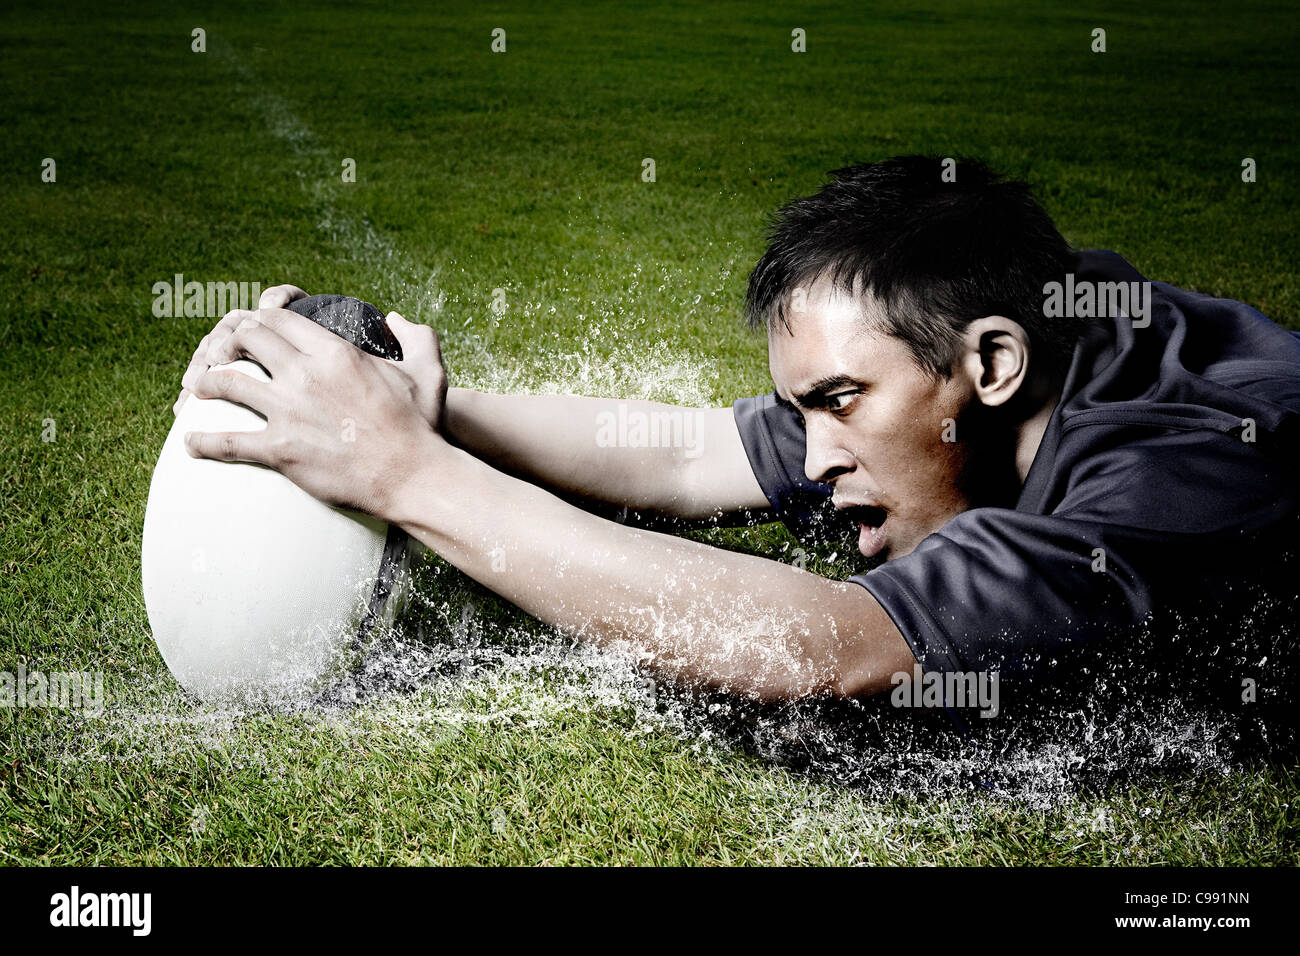 Rugby-Spieler auf nassen Feld Stockbild